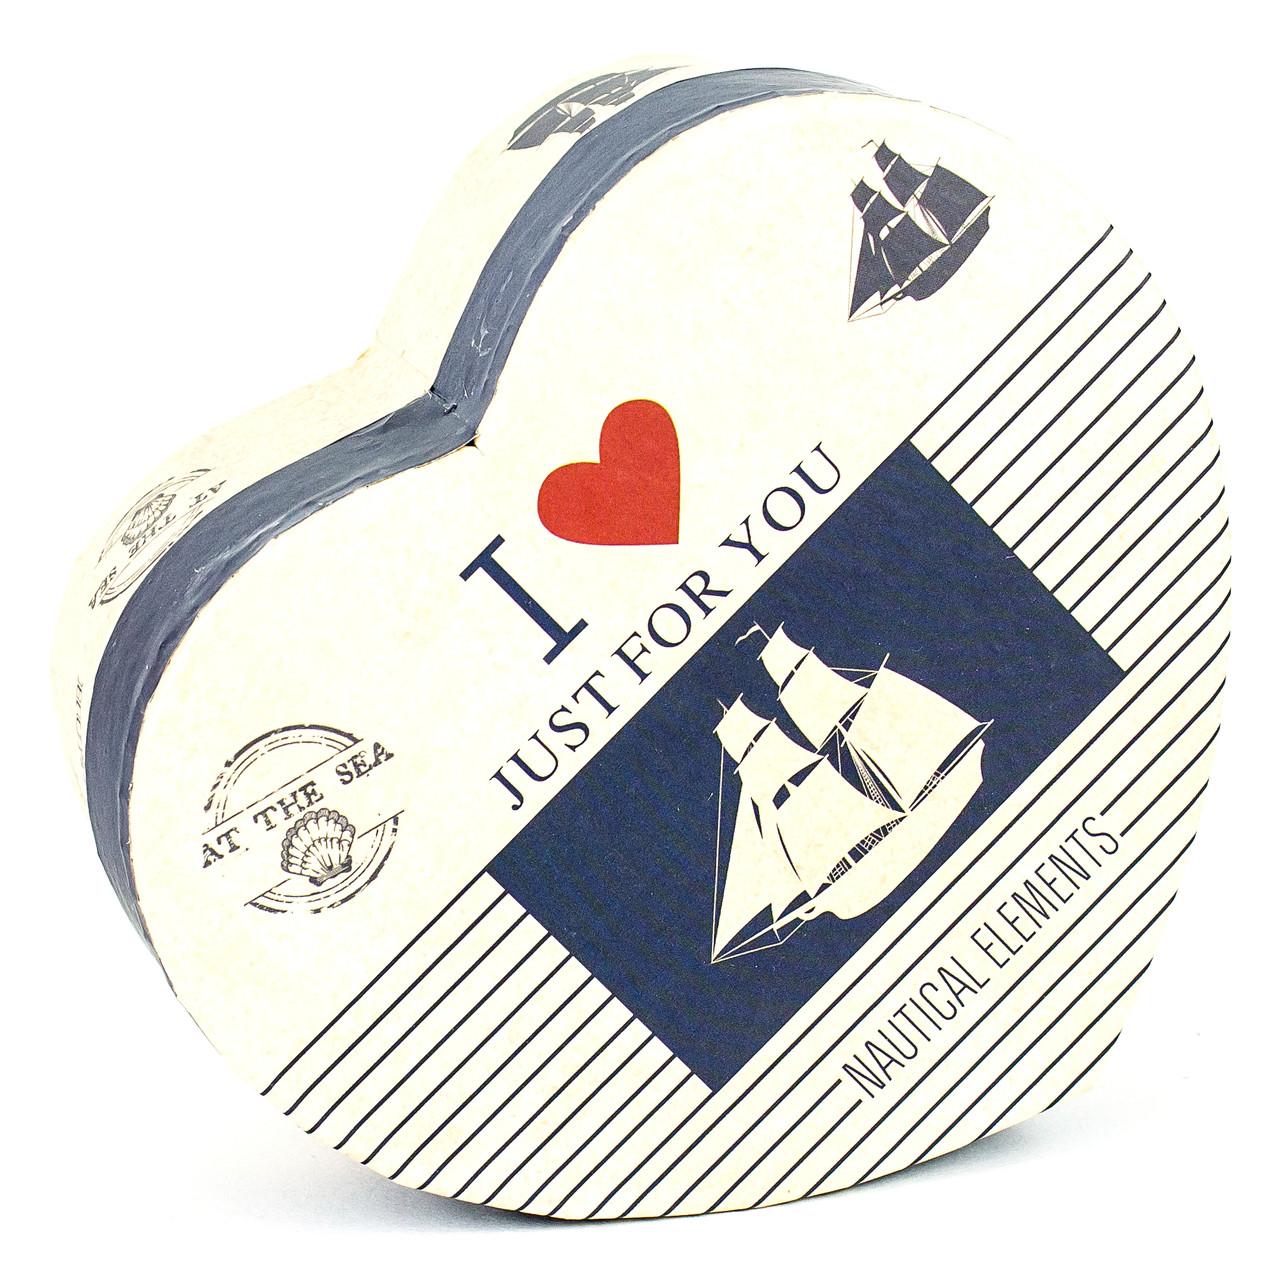 Подарочная коробка в форме сердца Парусник 15 x 13 x 7.2 см